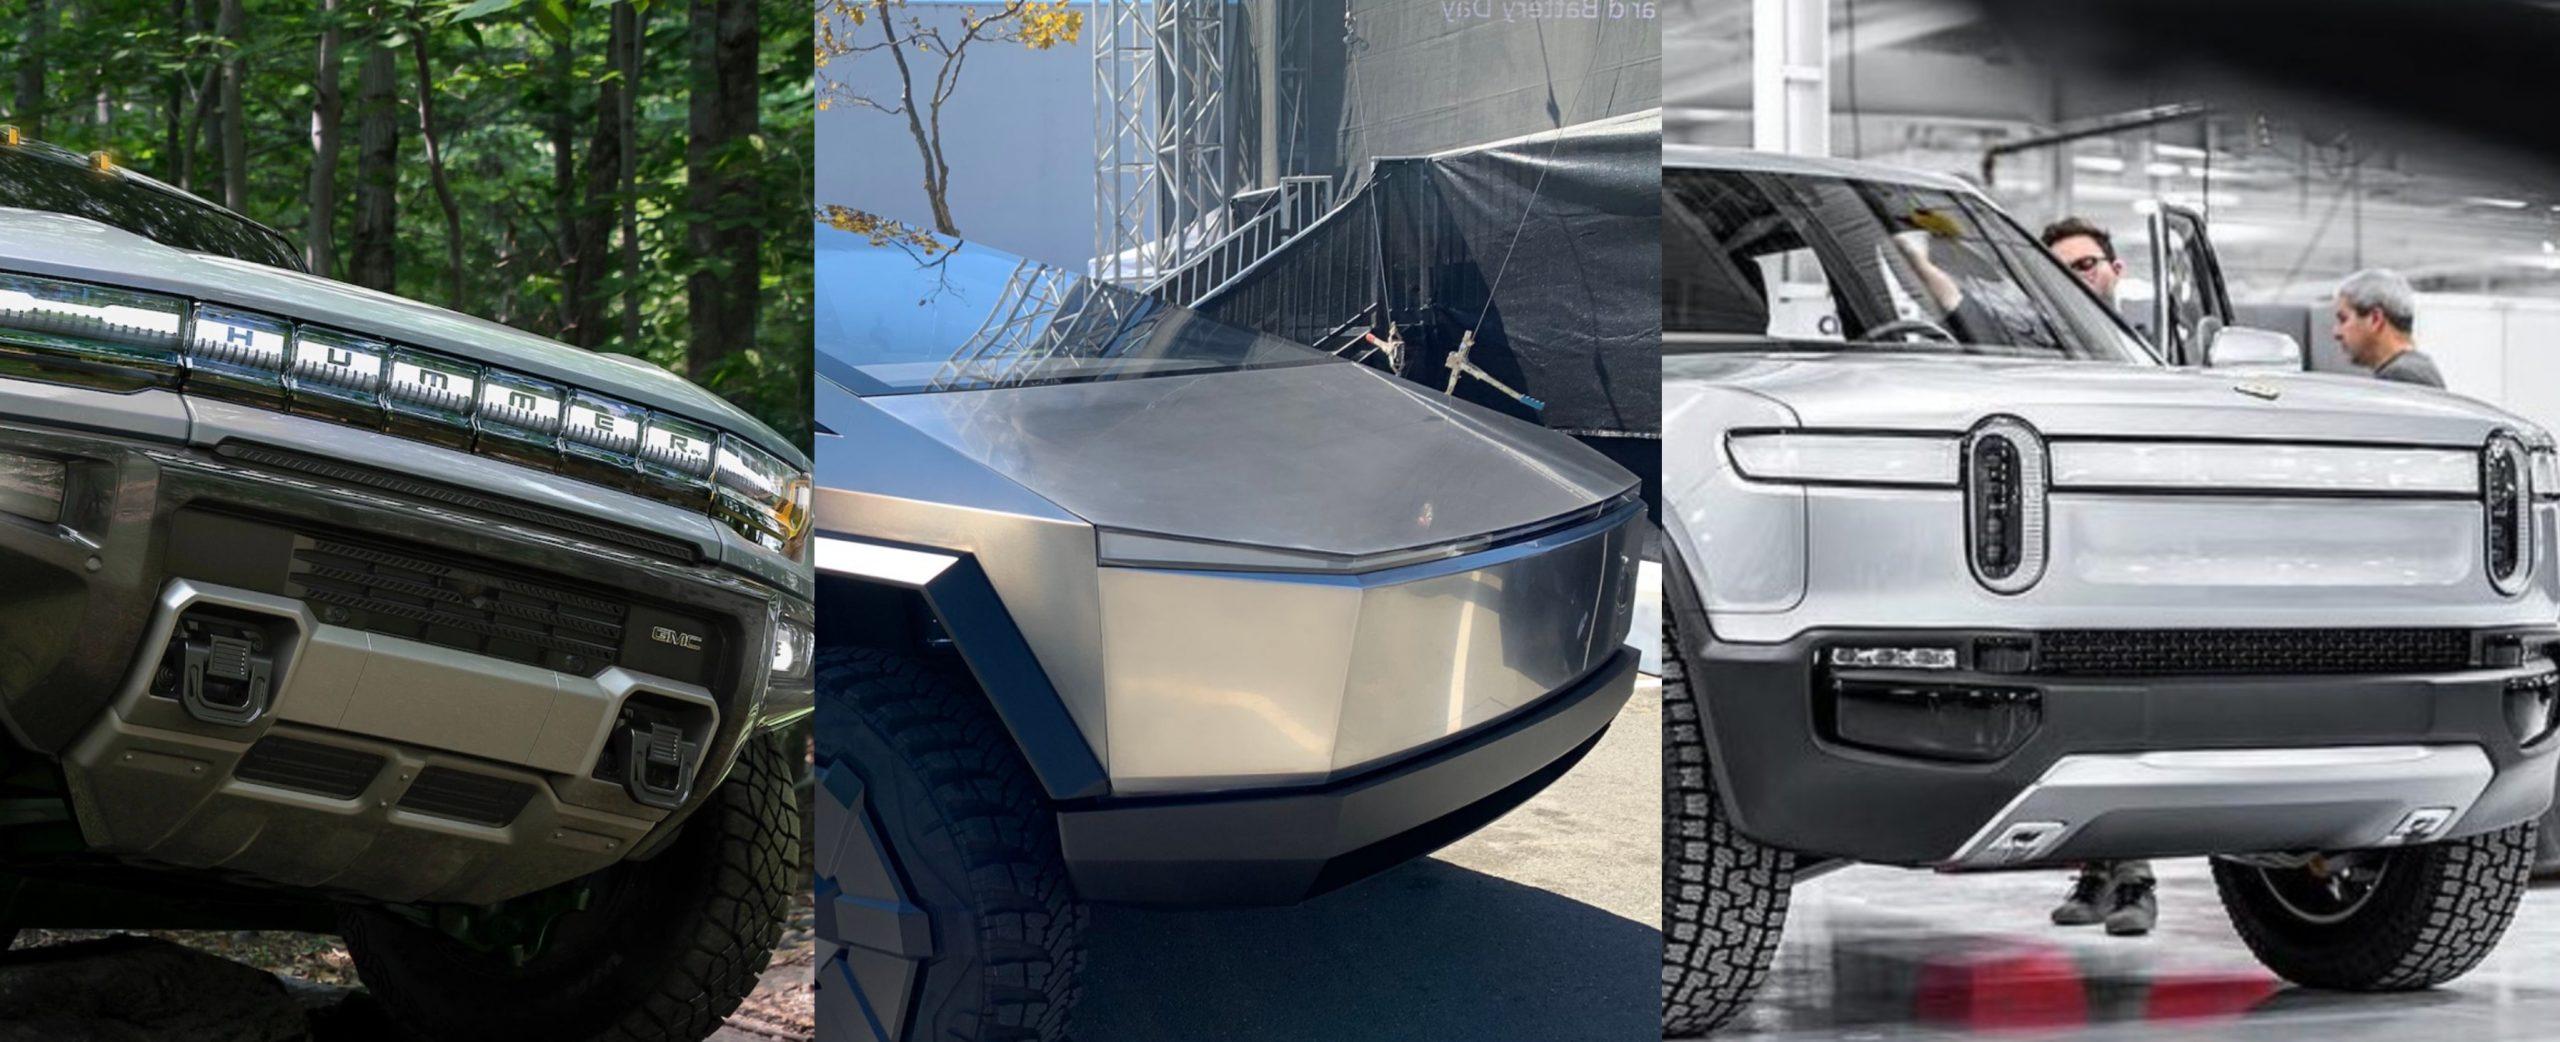 GM-Hummer-EV-Tesla-Cybertruck-Rivian-R1T